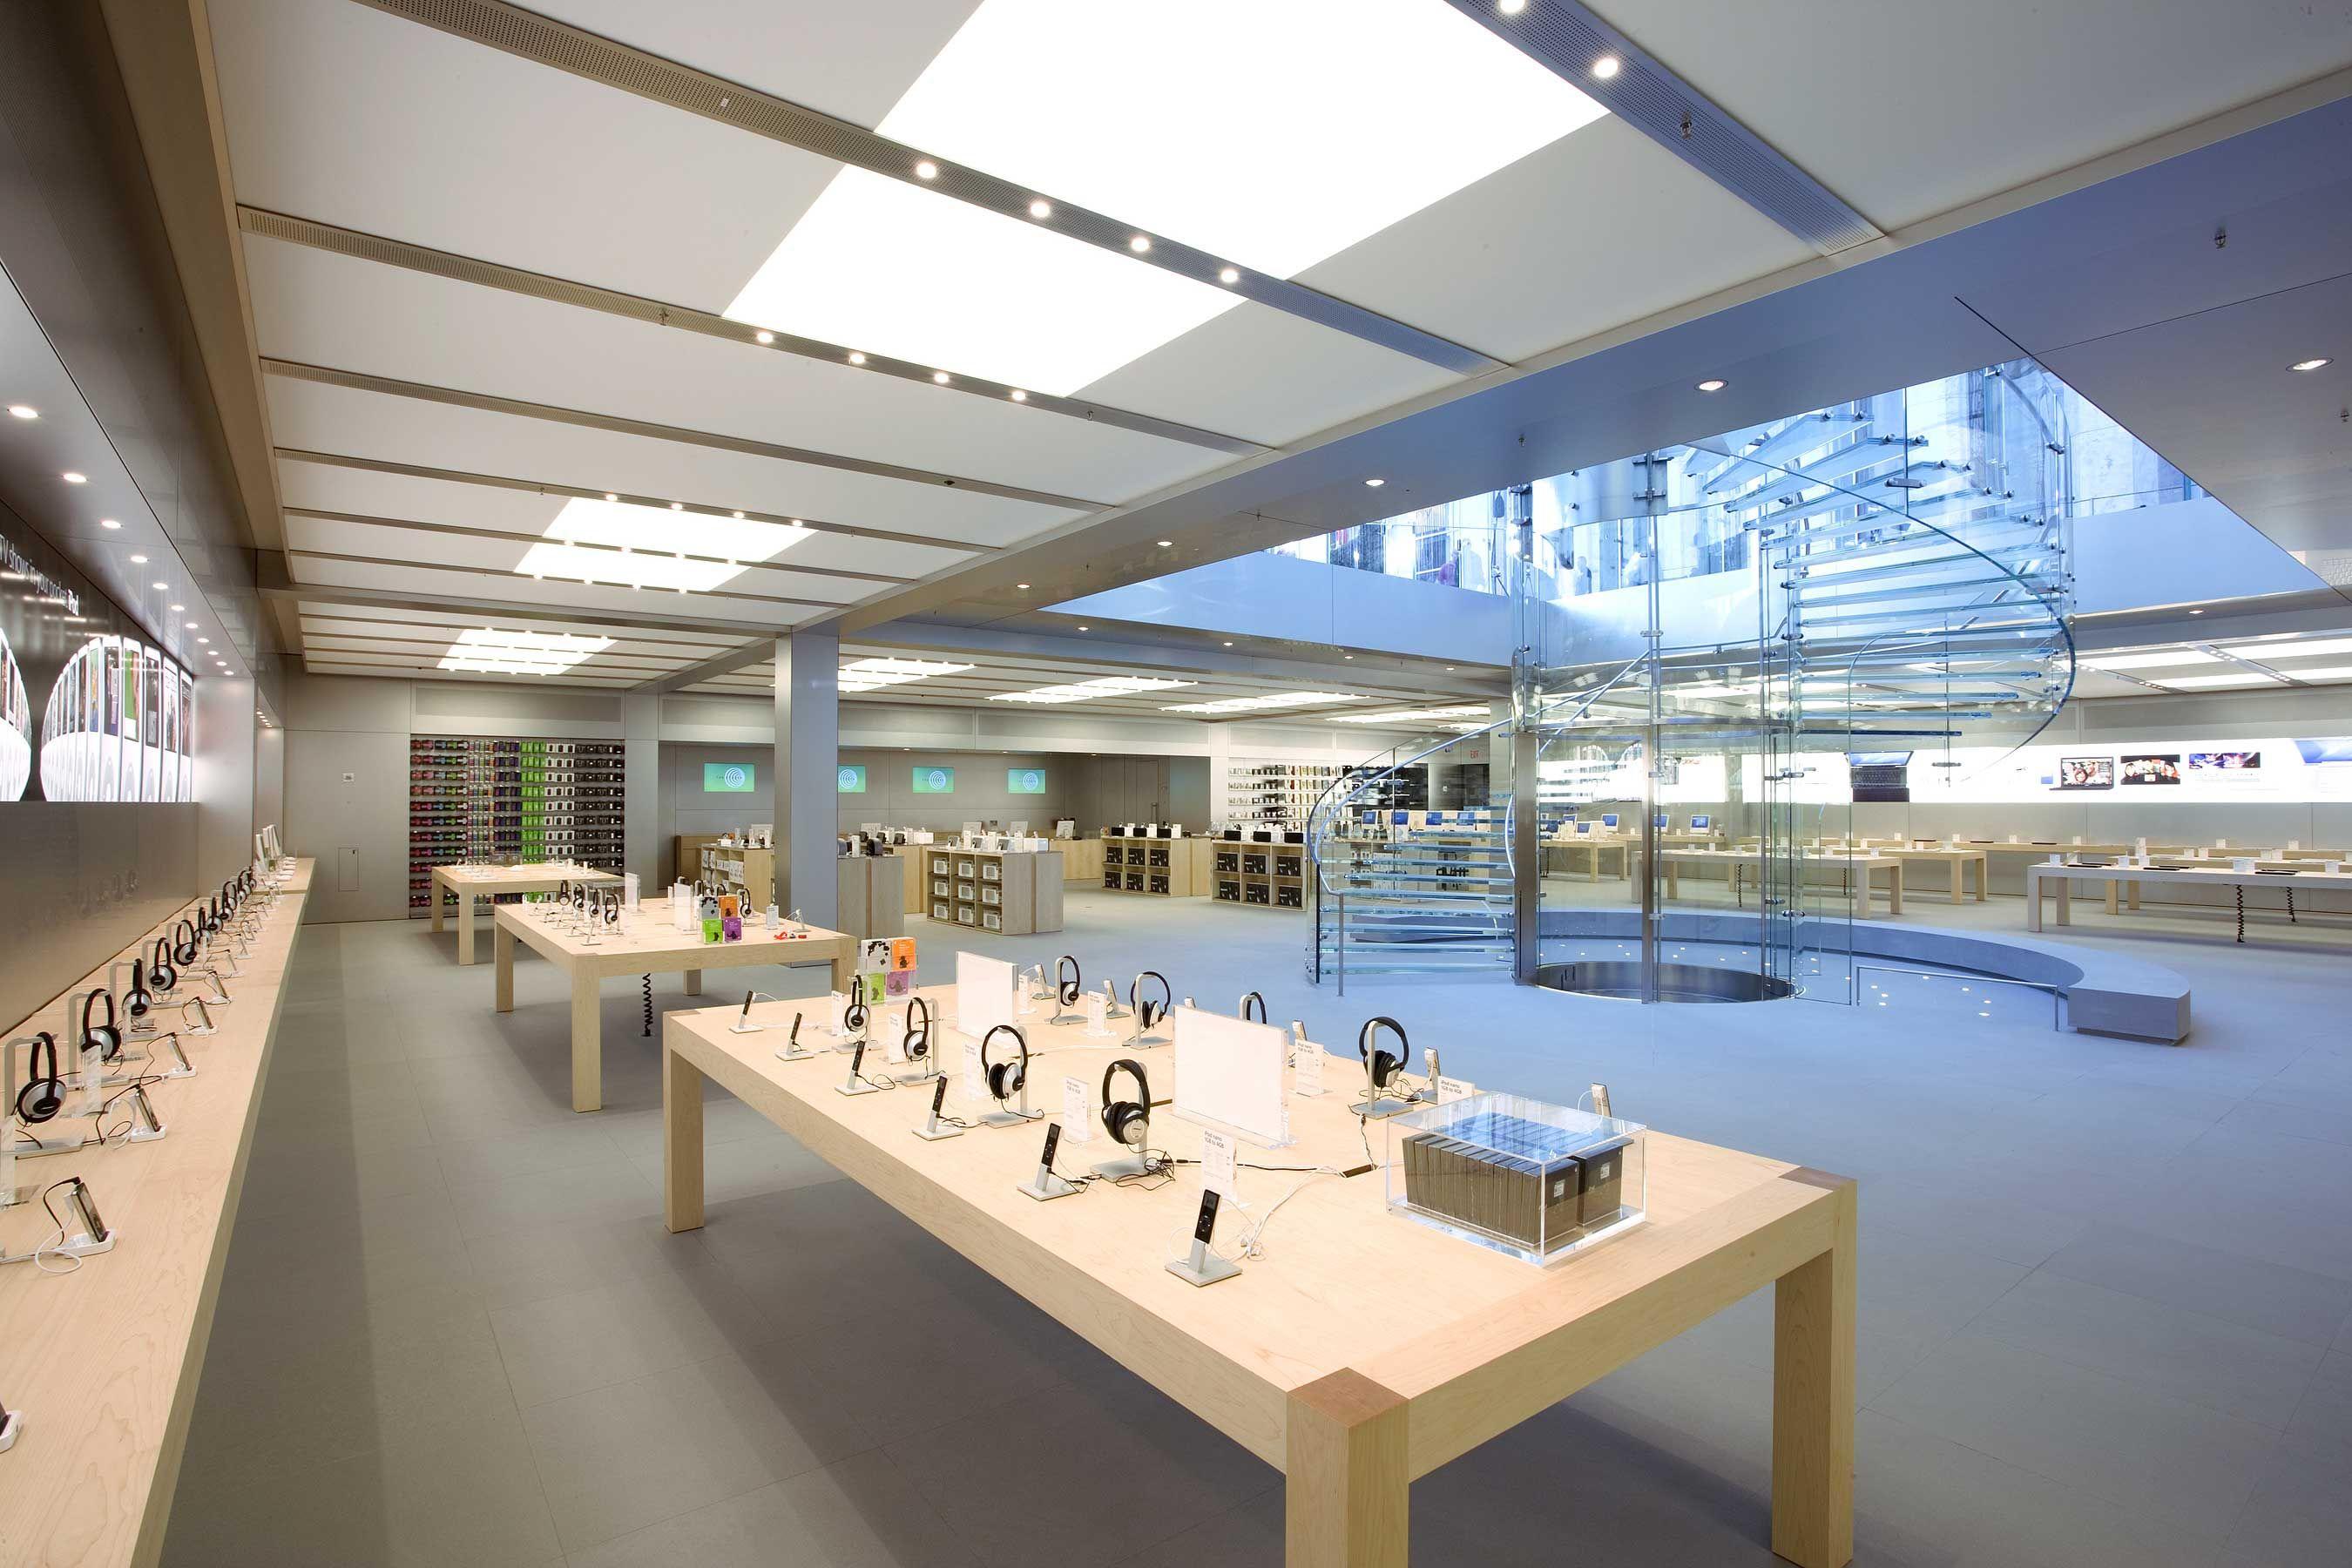 Leaked renderings of Apple Campus 2 interior depict futuristic Apple Store like design